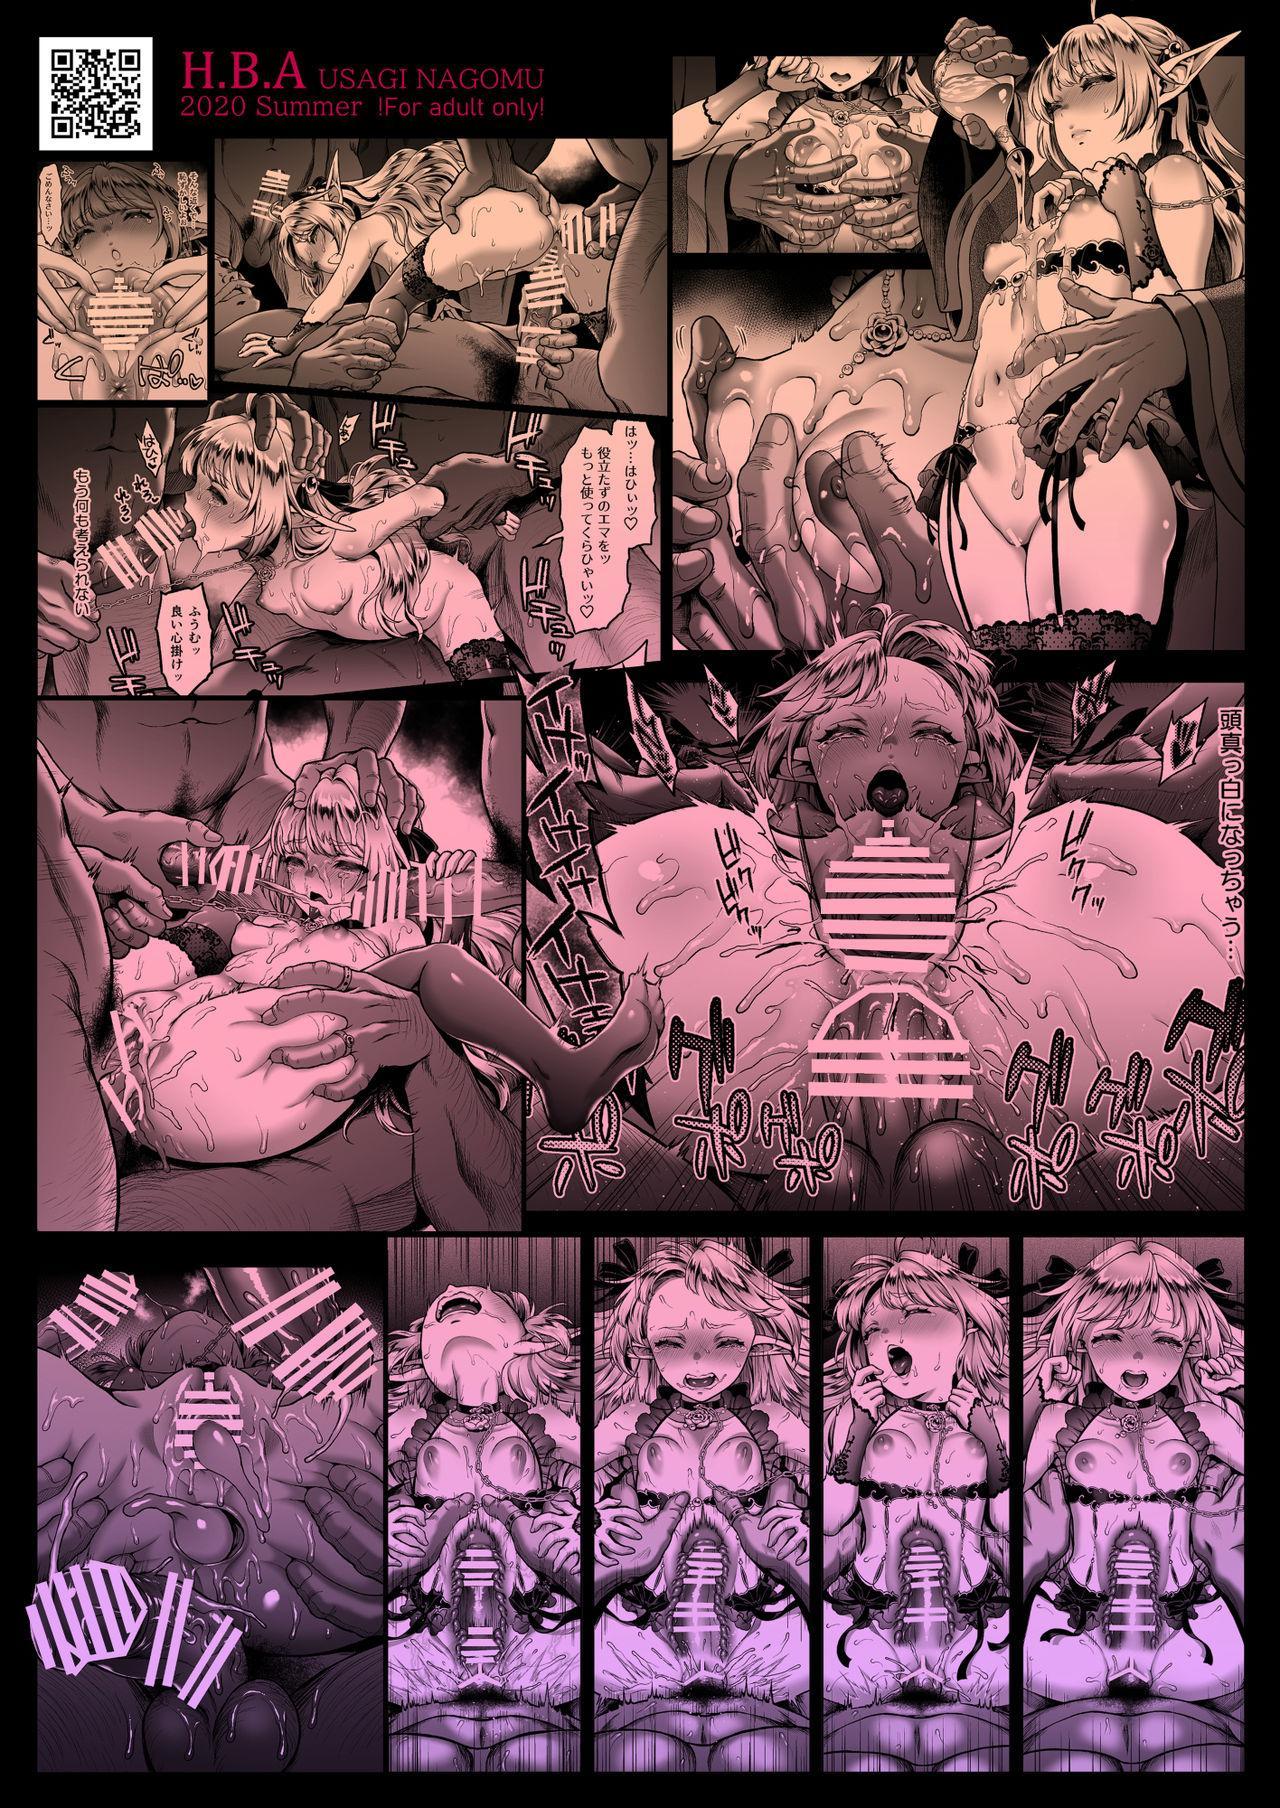 Tasogare no Shou Elf 6 - The story of Emma's side 34